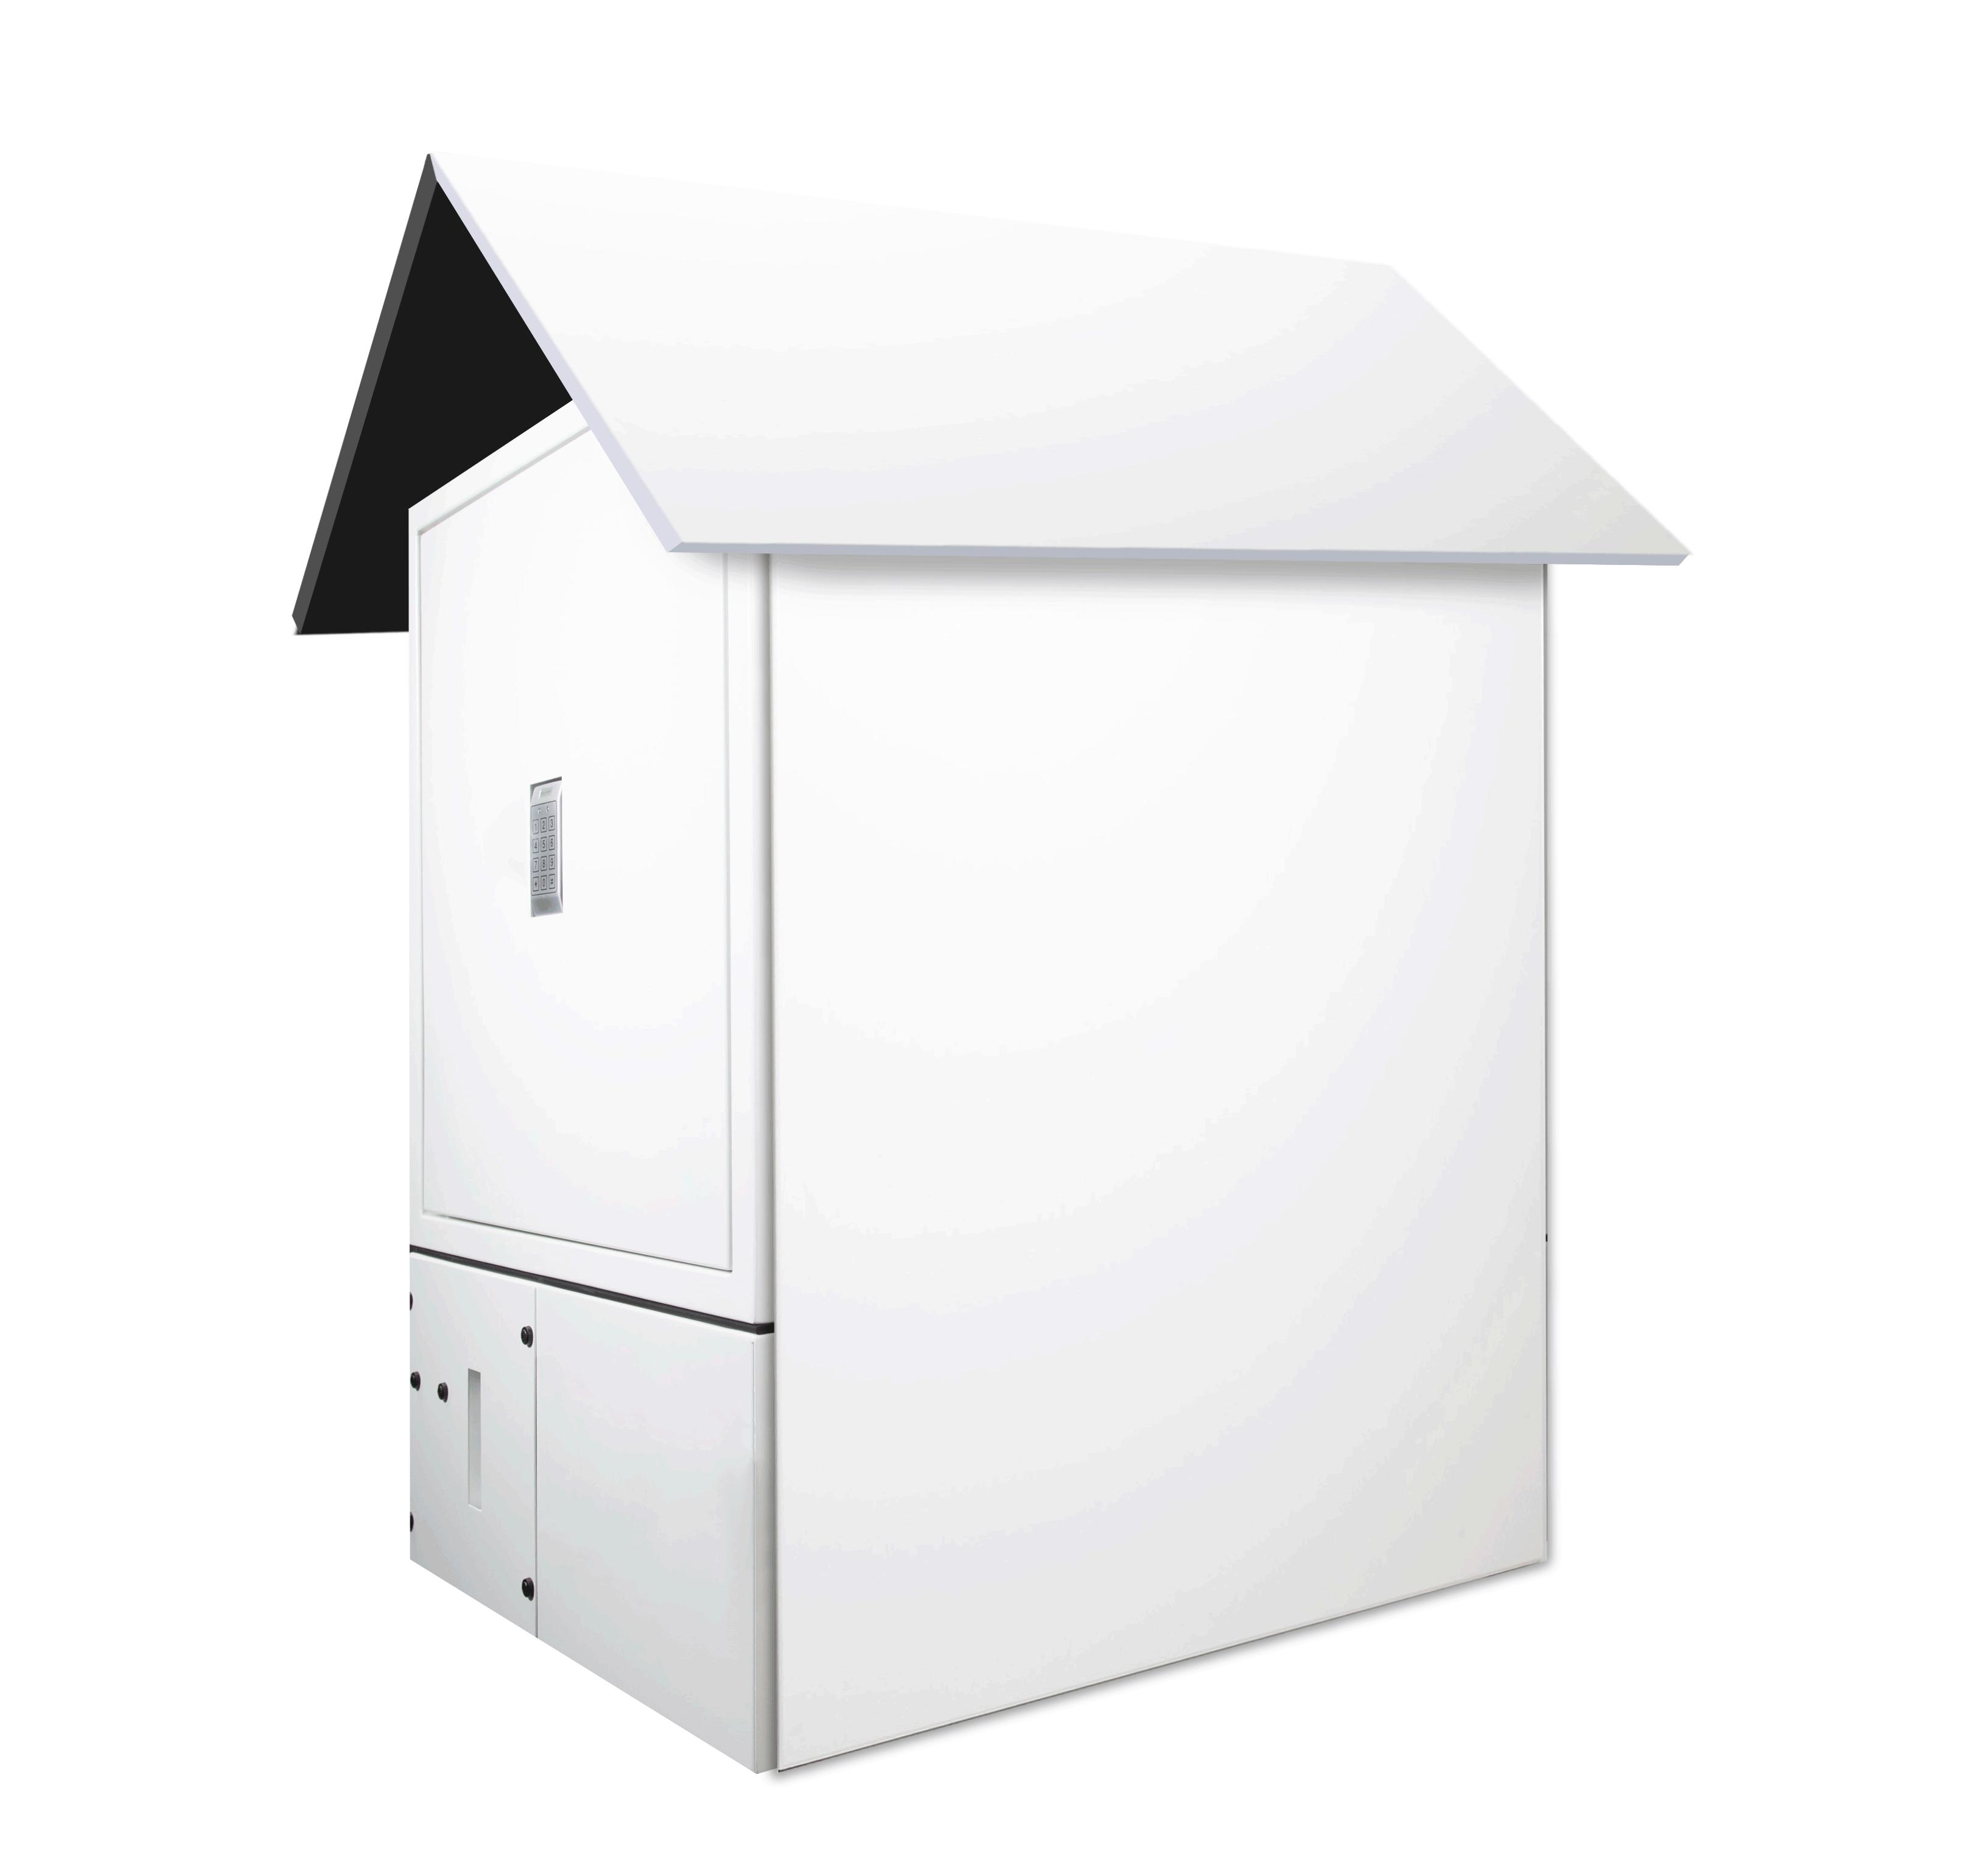 Zella DC | Zella Hut | Outdoor Micro Data Center | Micro Data Center | Outdoor | Zella Hut Tech Sheet | Modular Micro Data Center Solutions